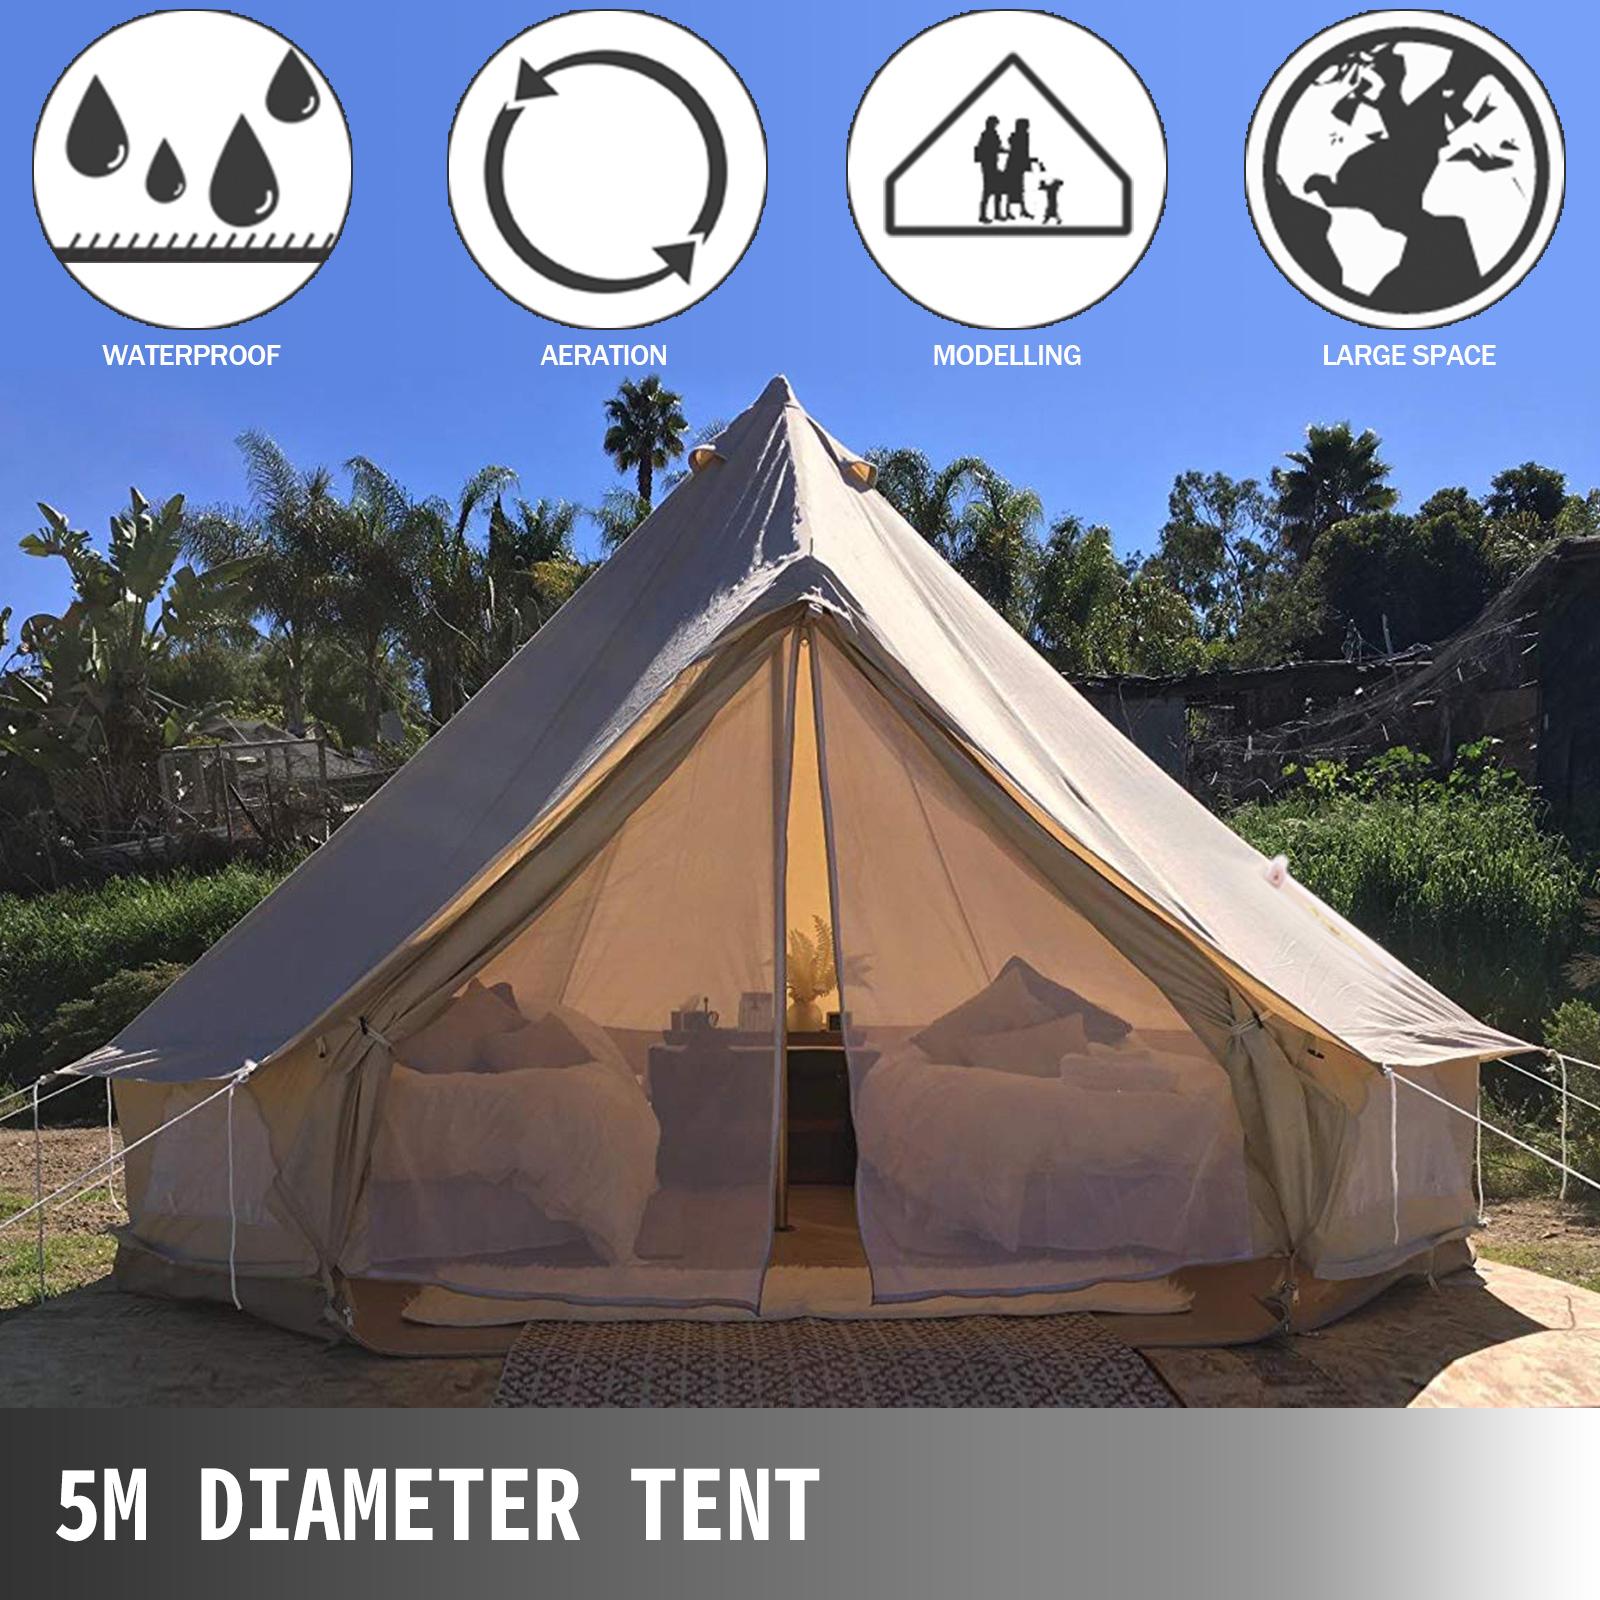 4-Season-Bell-Tent-3-4-5-6M-Waterproof-Cotton-Canvas-Glamping-Camping-Beach-US thumbnail 40